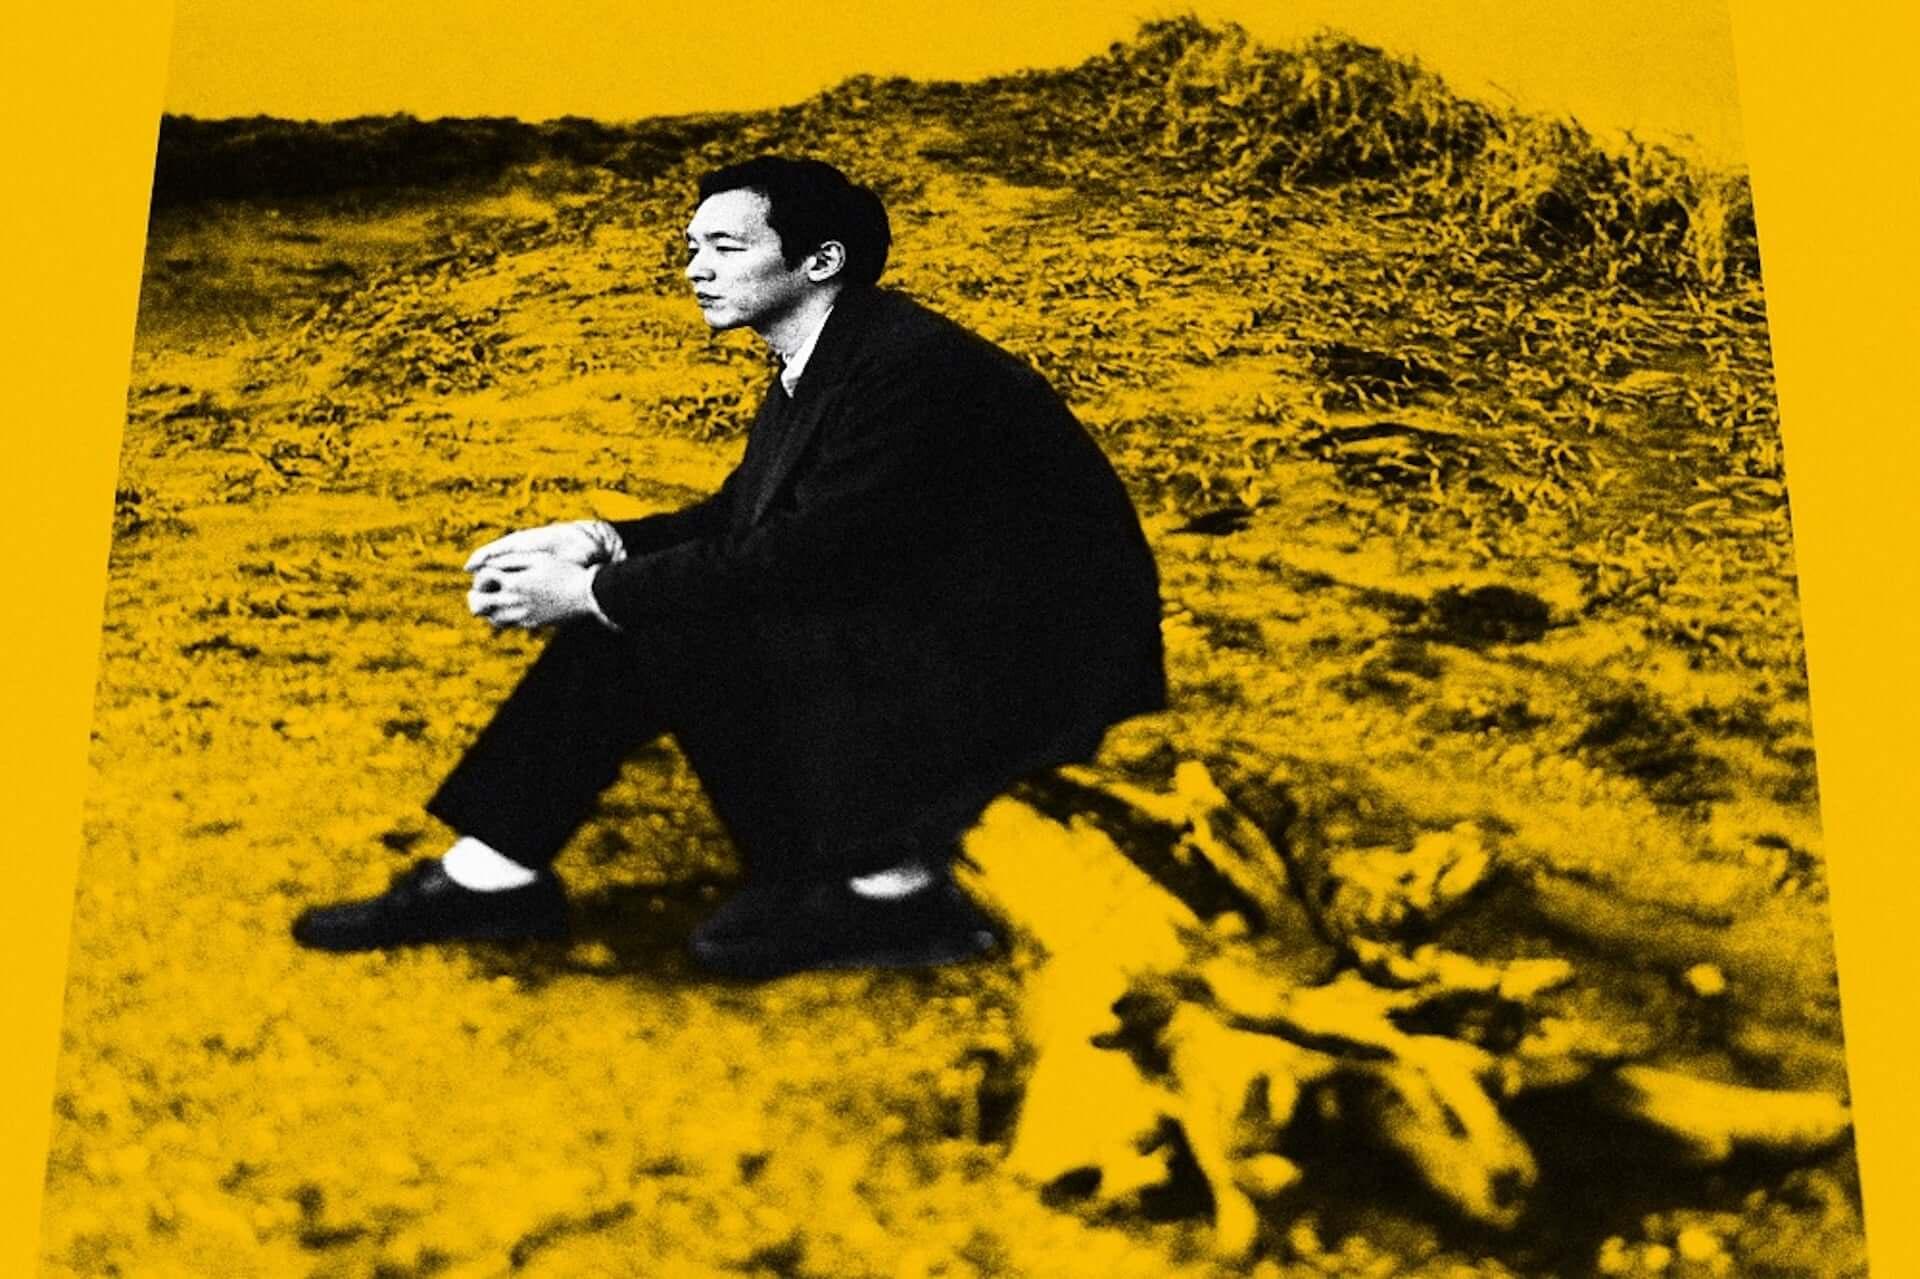 "cero髙城晶平ソロプロジェクトShohei Takagi Parallela Botanicaの1stアルバムから""ミッドナイト・ランデヴー""が配信開始!ティザー映像も公開 music200325_shohei_takagi_1-1920x1279"